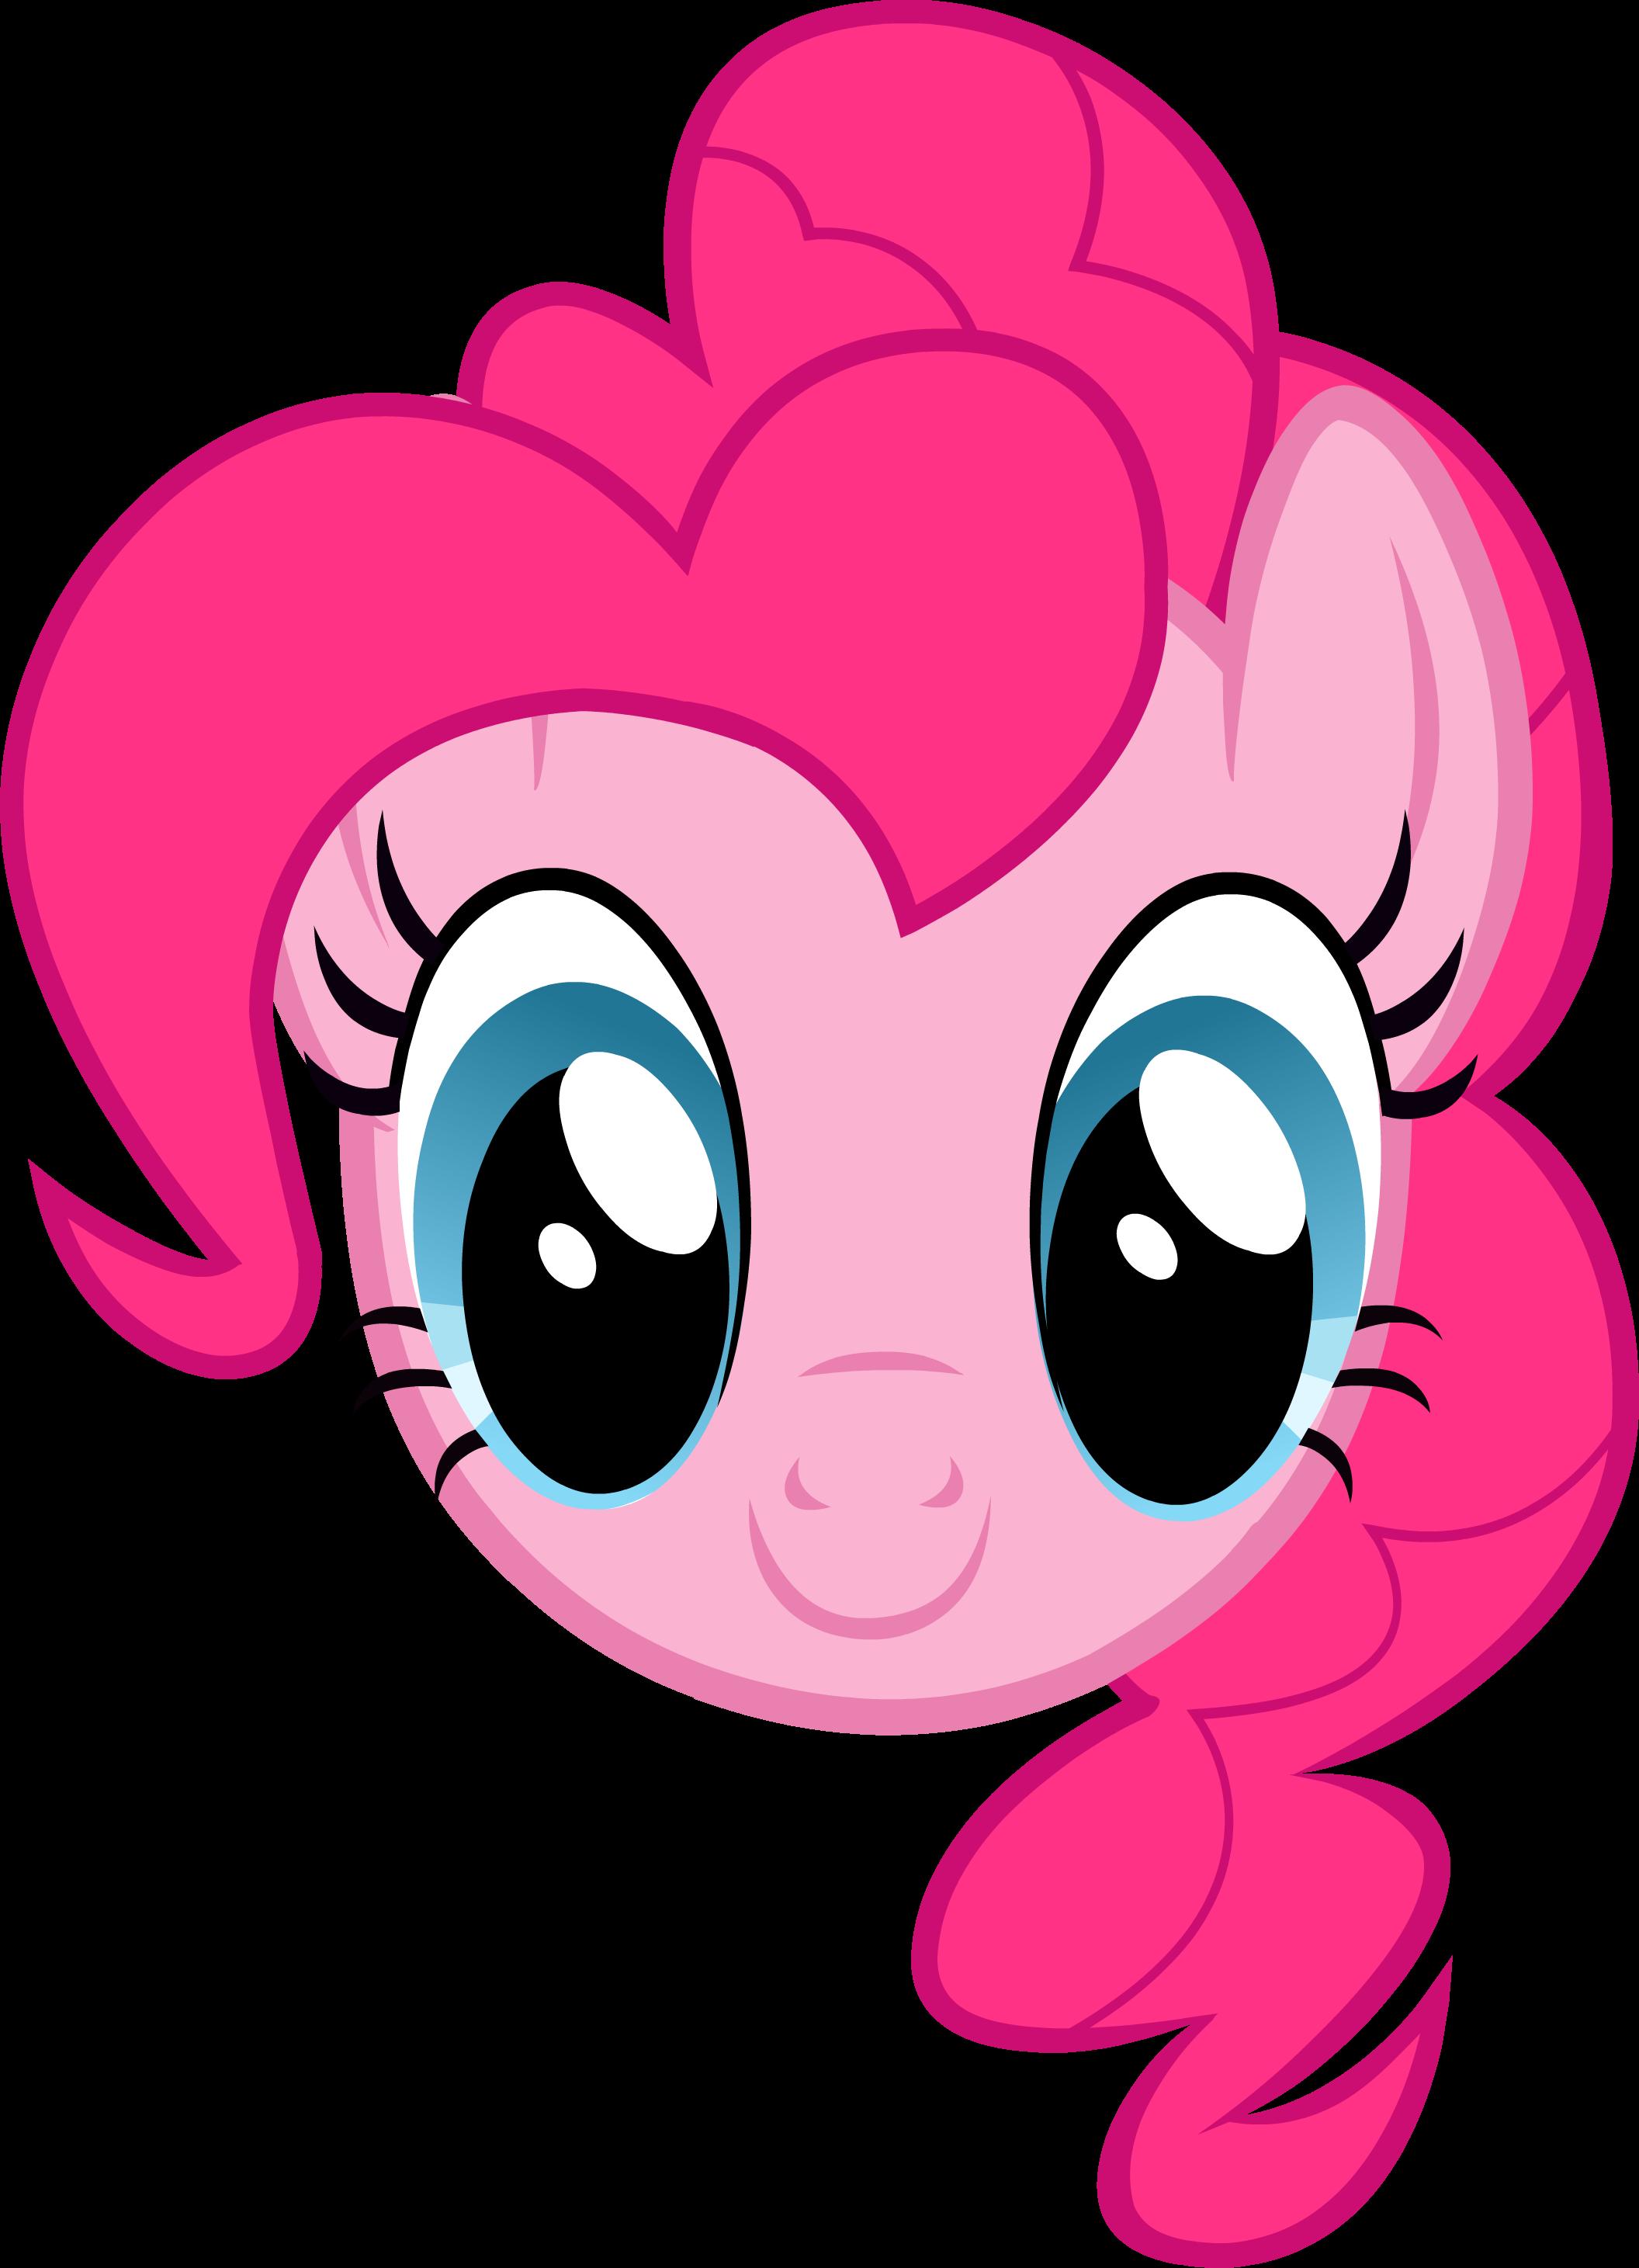 MLP - Pinkie Pie Headshot   Headshots of My Little Pony ...   2112 x 2922 png 347kB